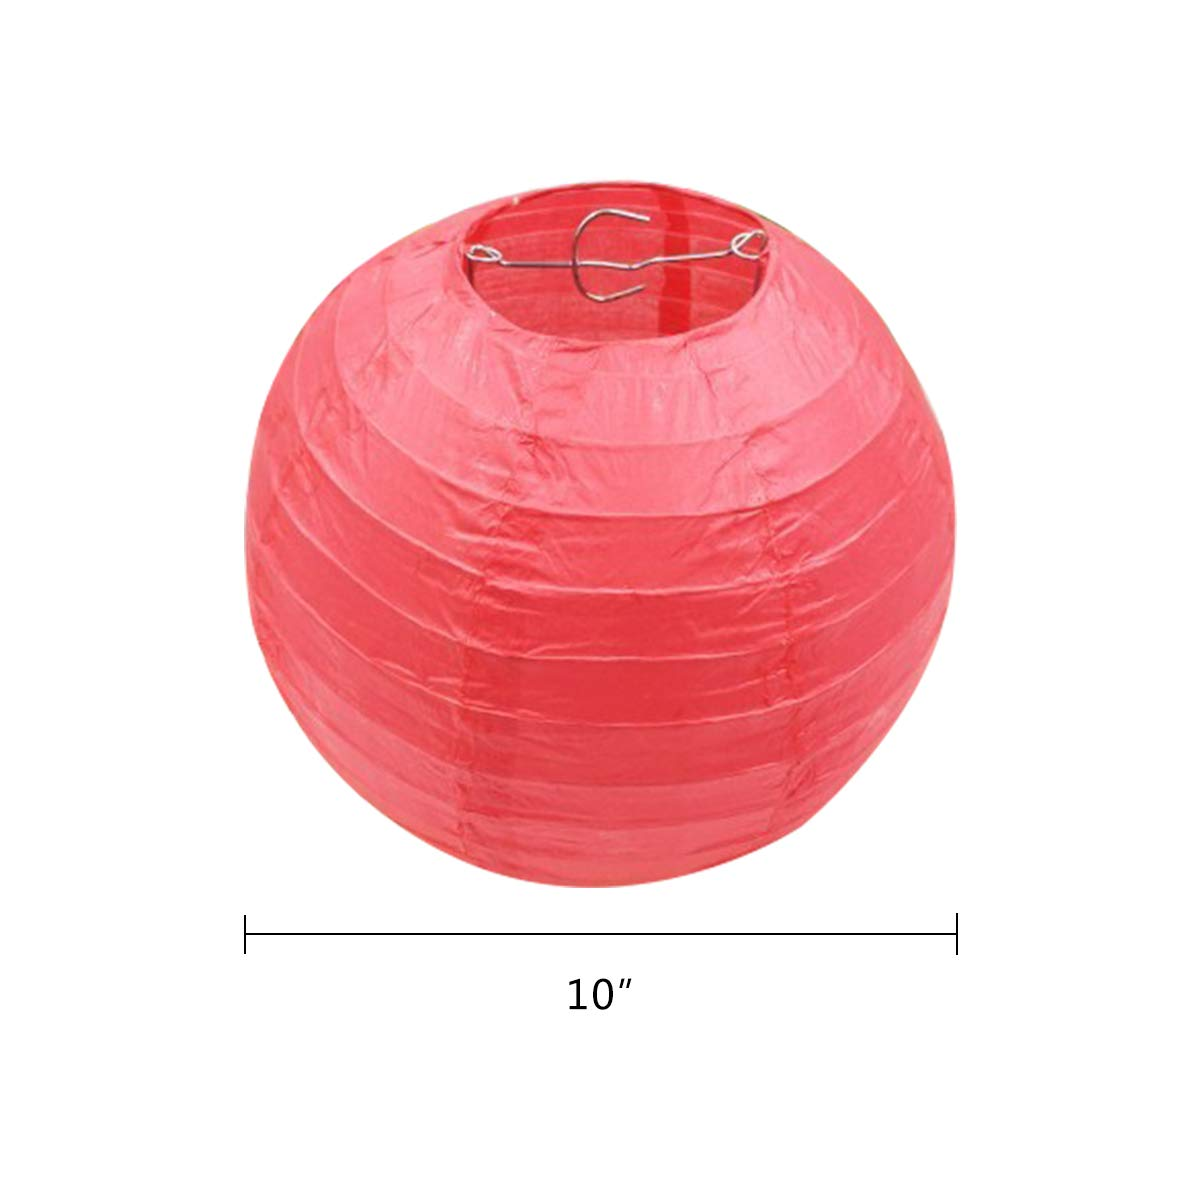 Amazon.com: Cieovo - Farol de papel chino de globo de aire ...